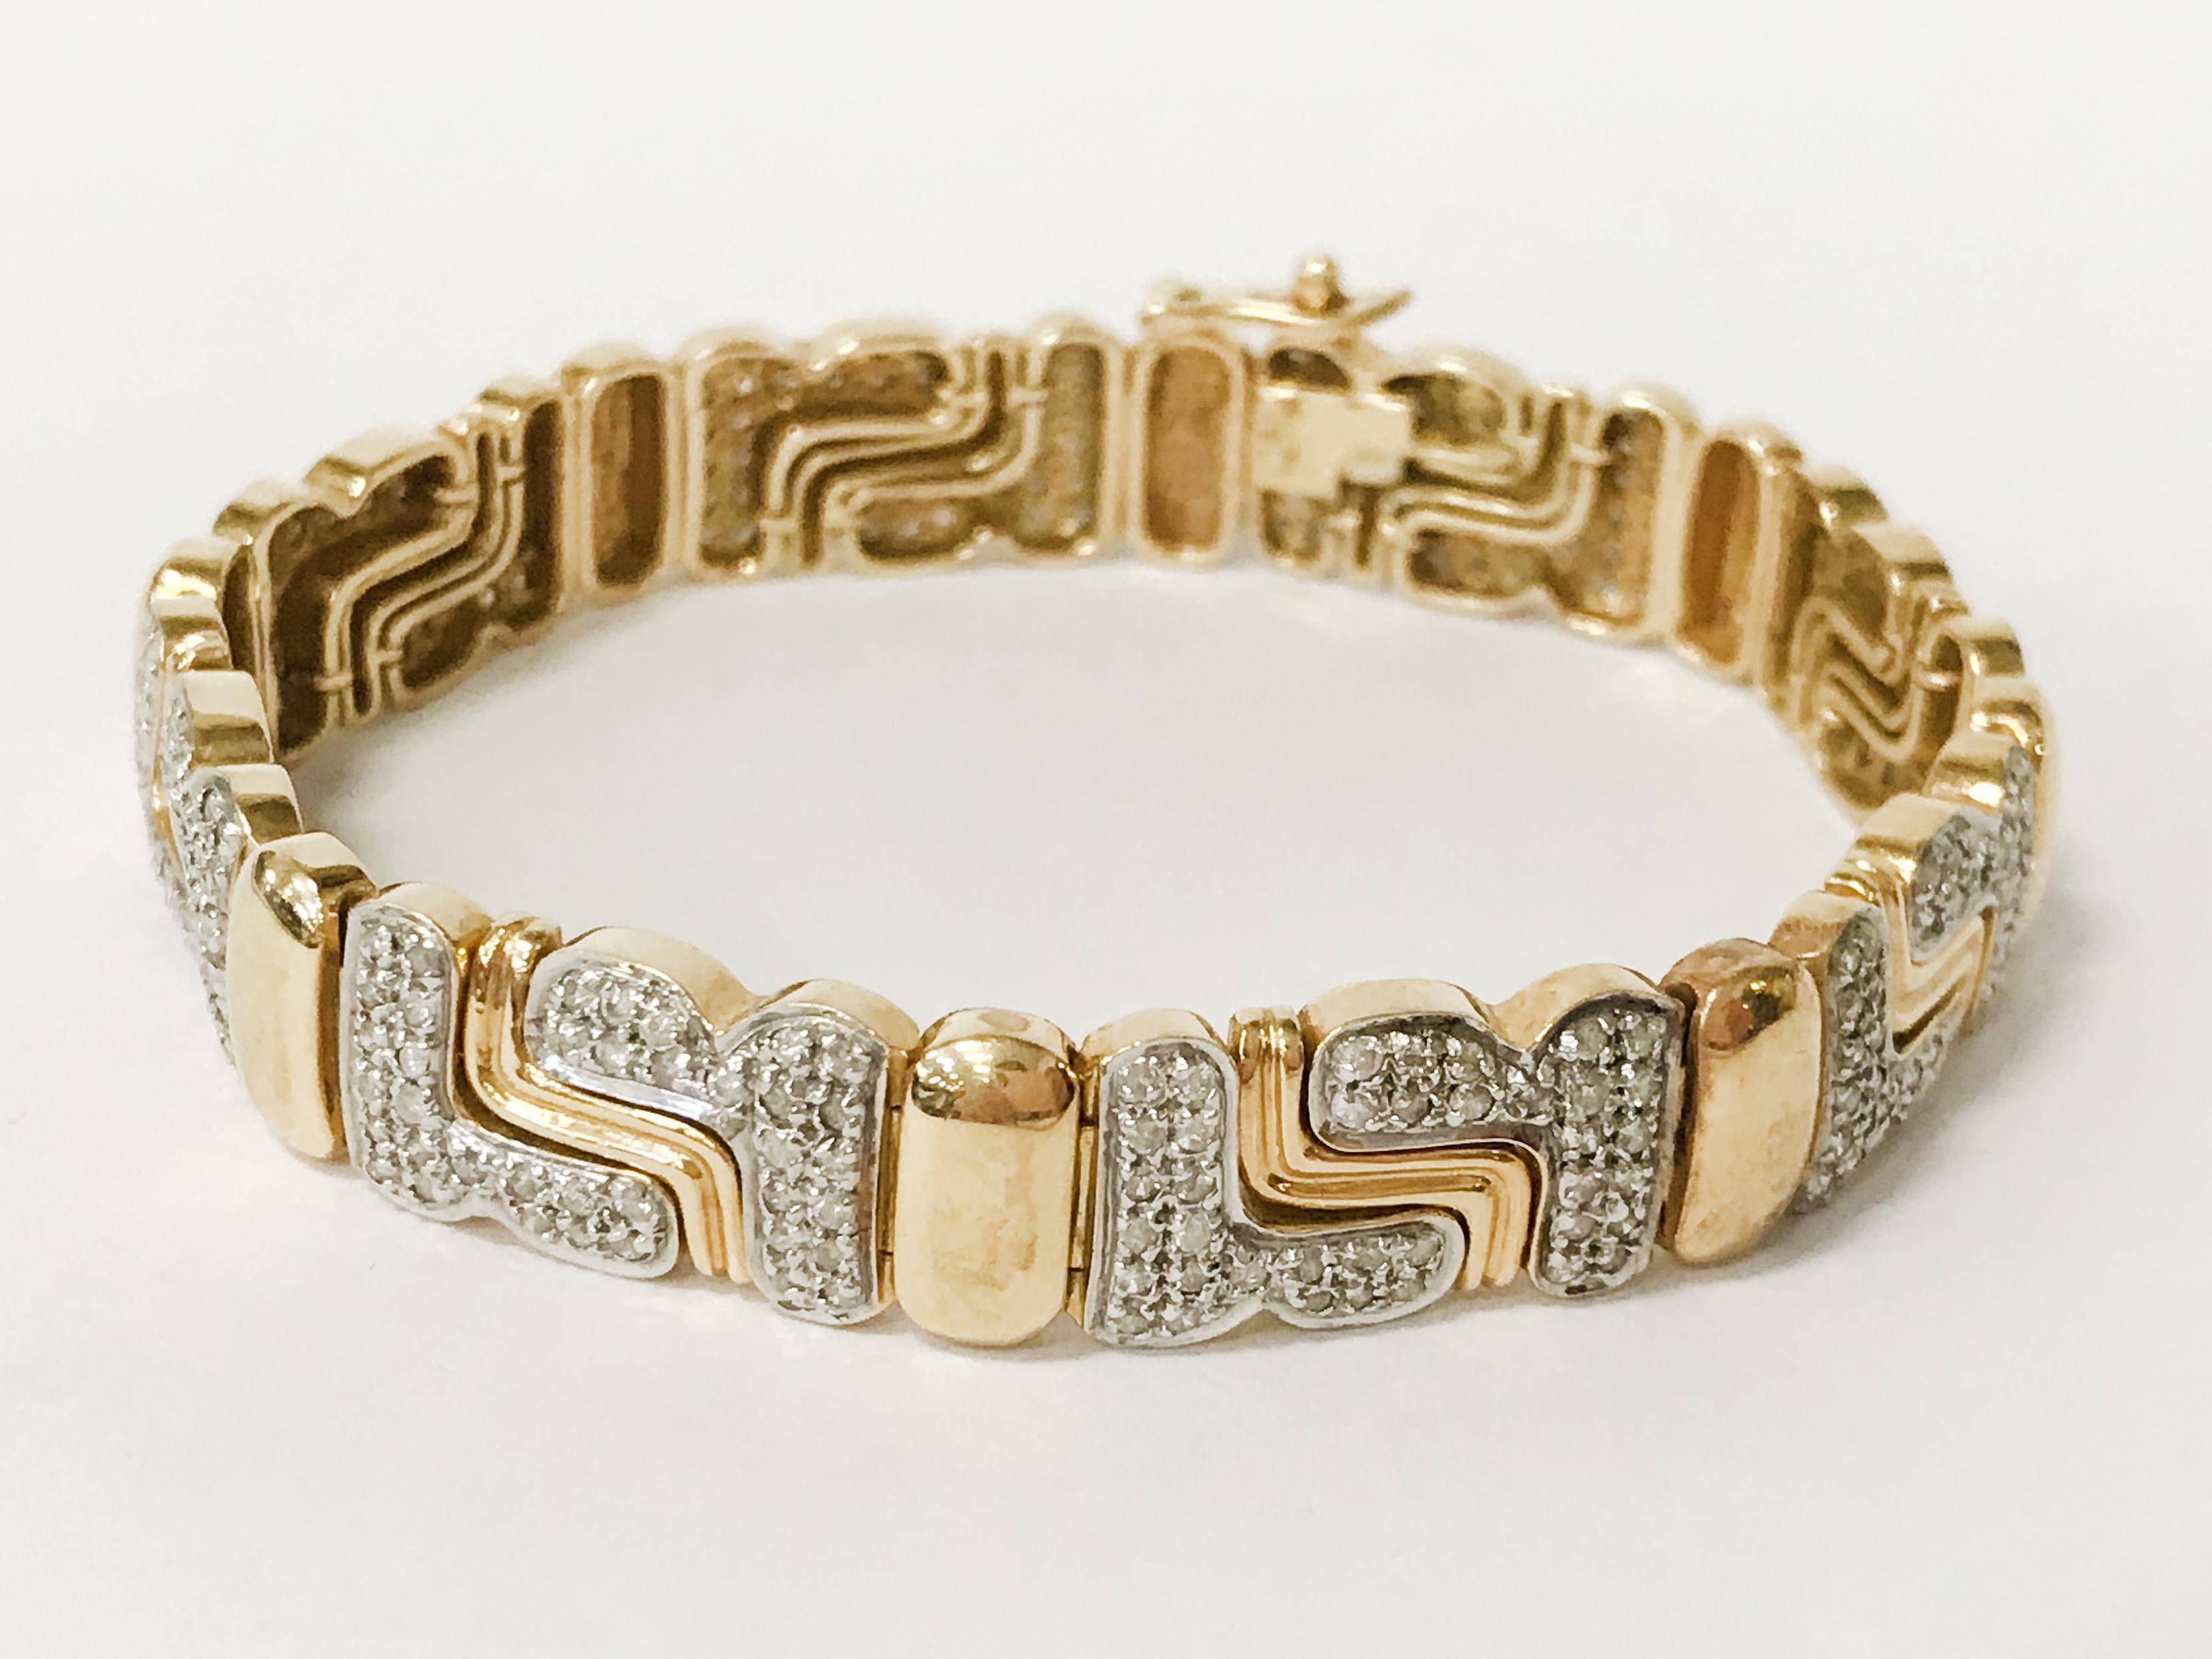 18CT GOLD & DIAMOND BRACELET - APPROX 36 GRAMS